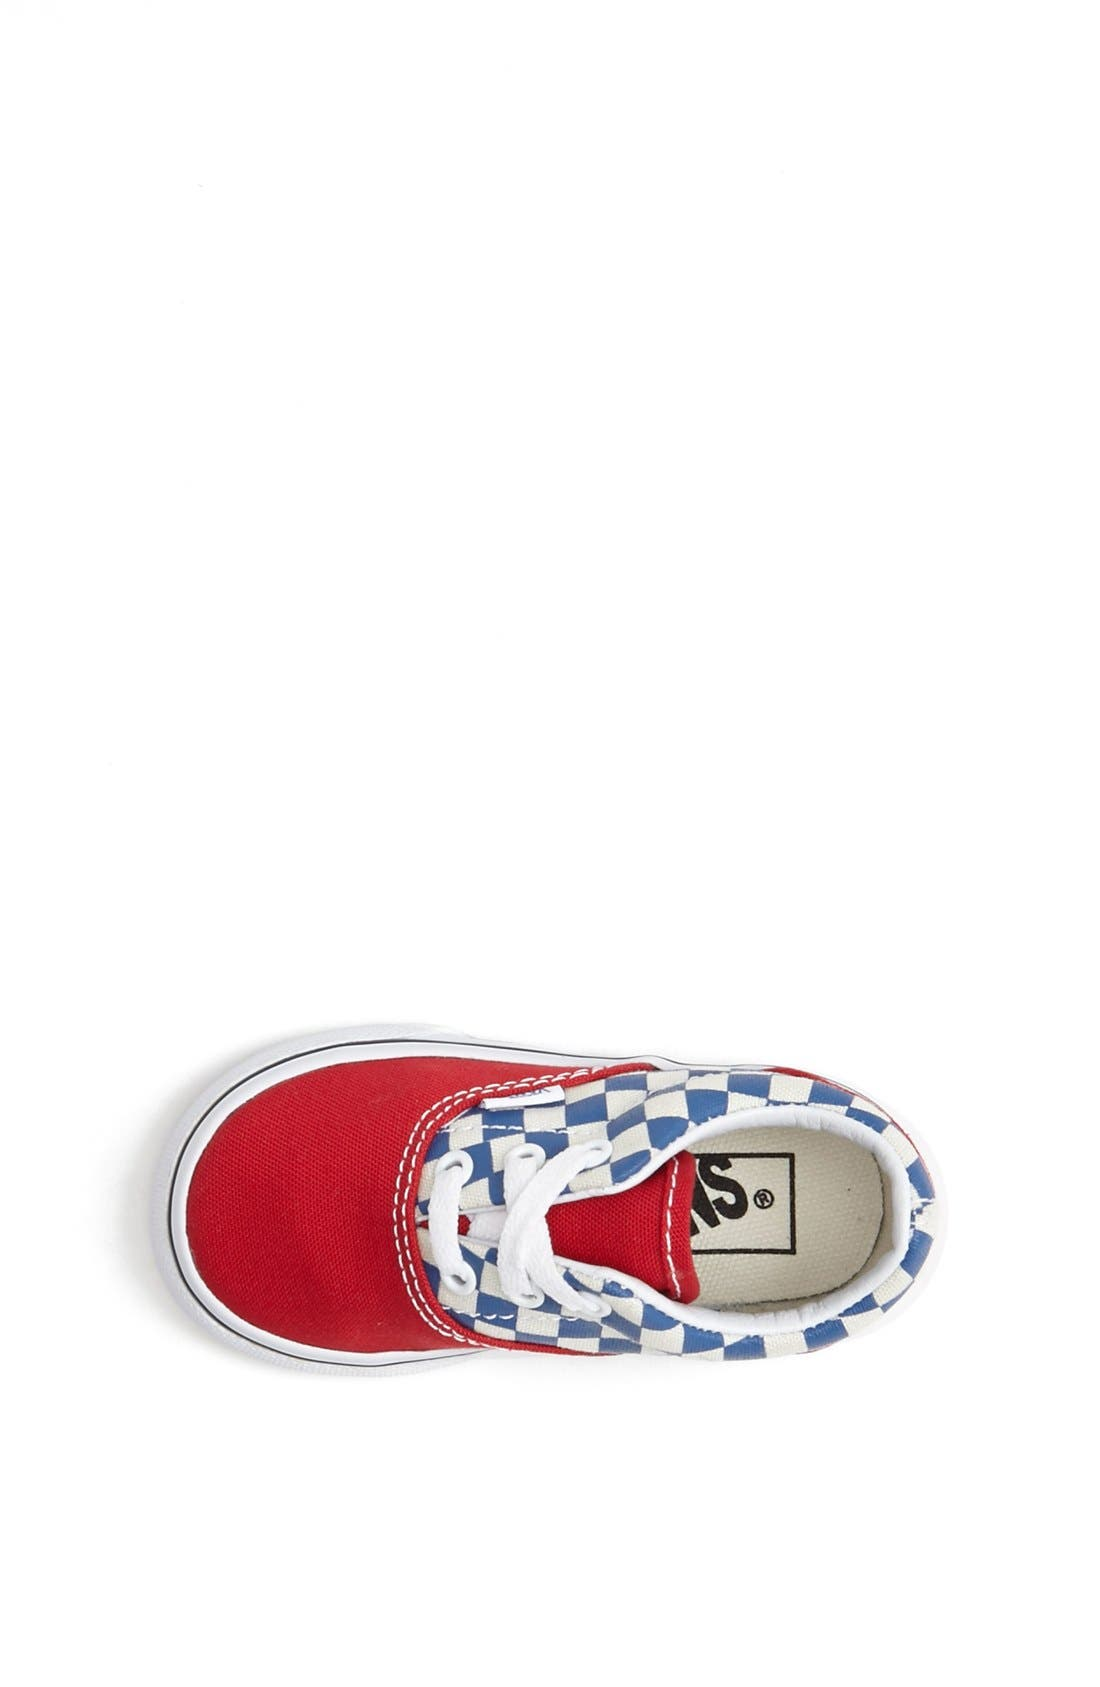 Alternate Image 3  - Vans 'Era - Checkerboard' Sneaker (Baby, Walker & Toddler)